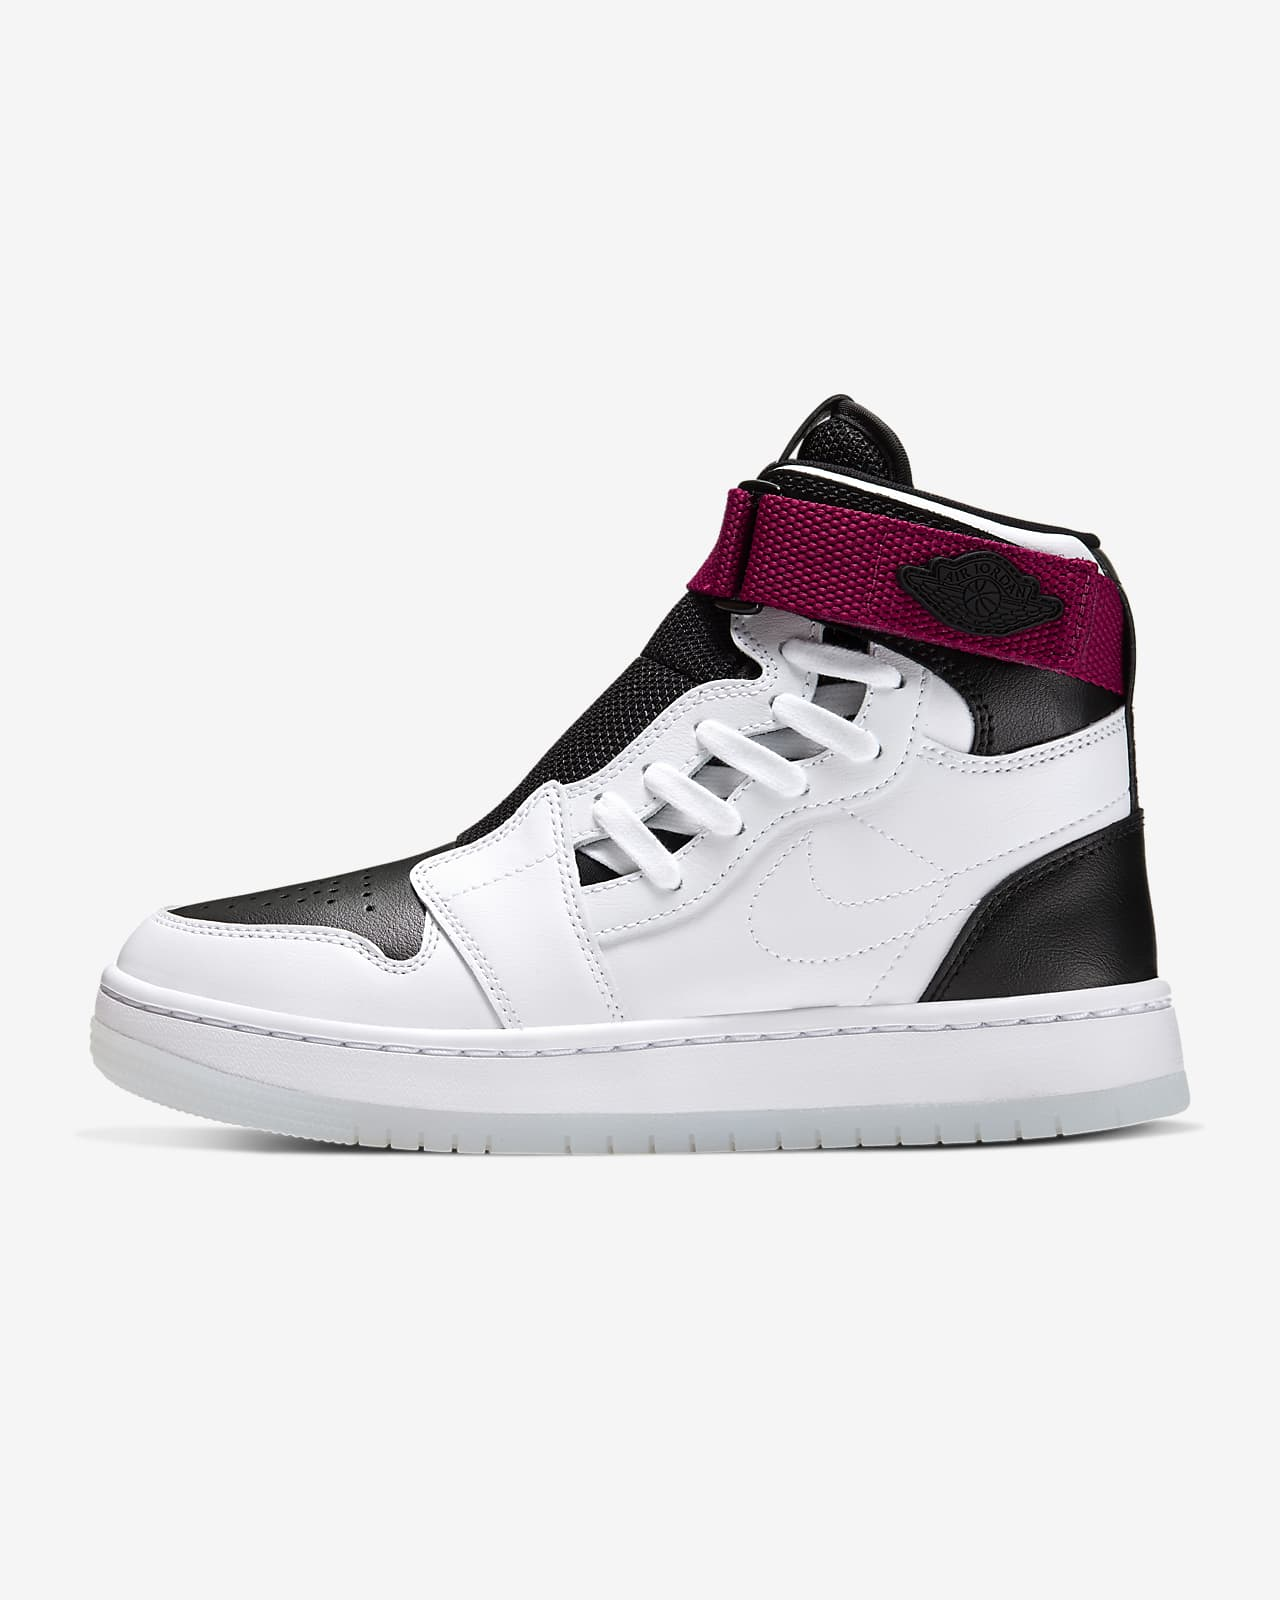 Air Jordan 1 Nova XX Women's Shoes